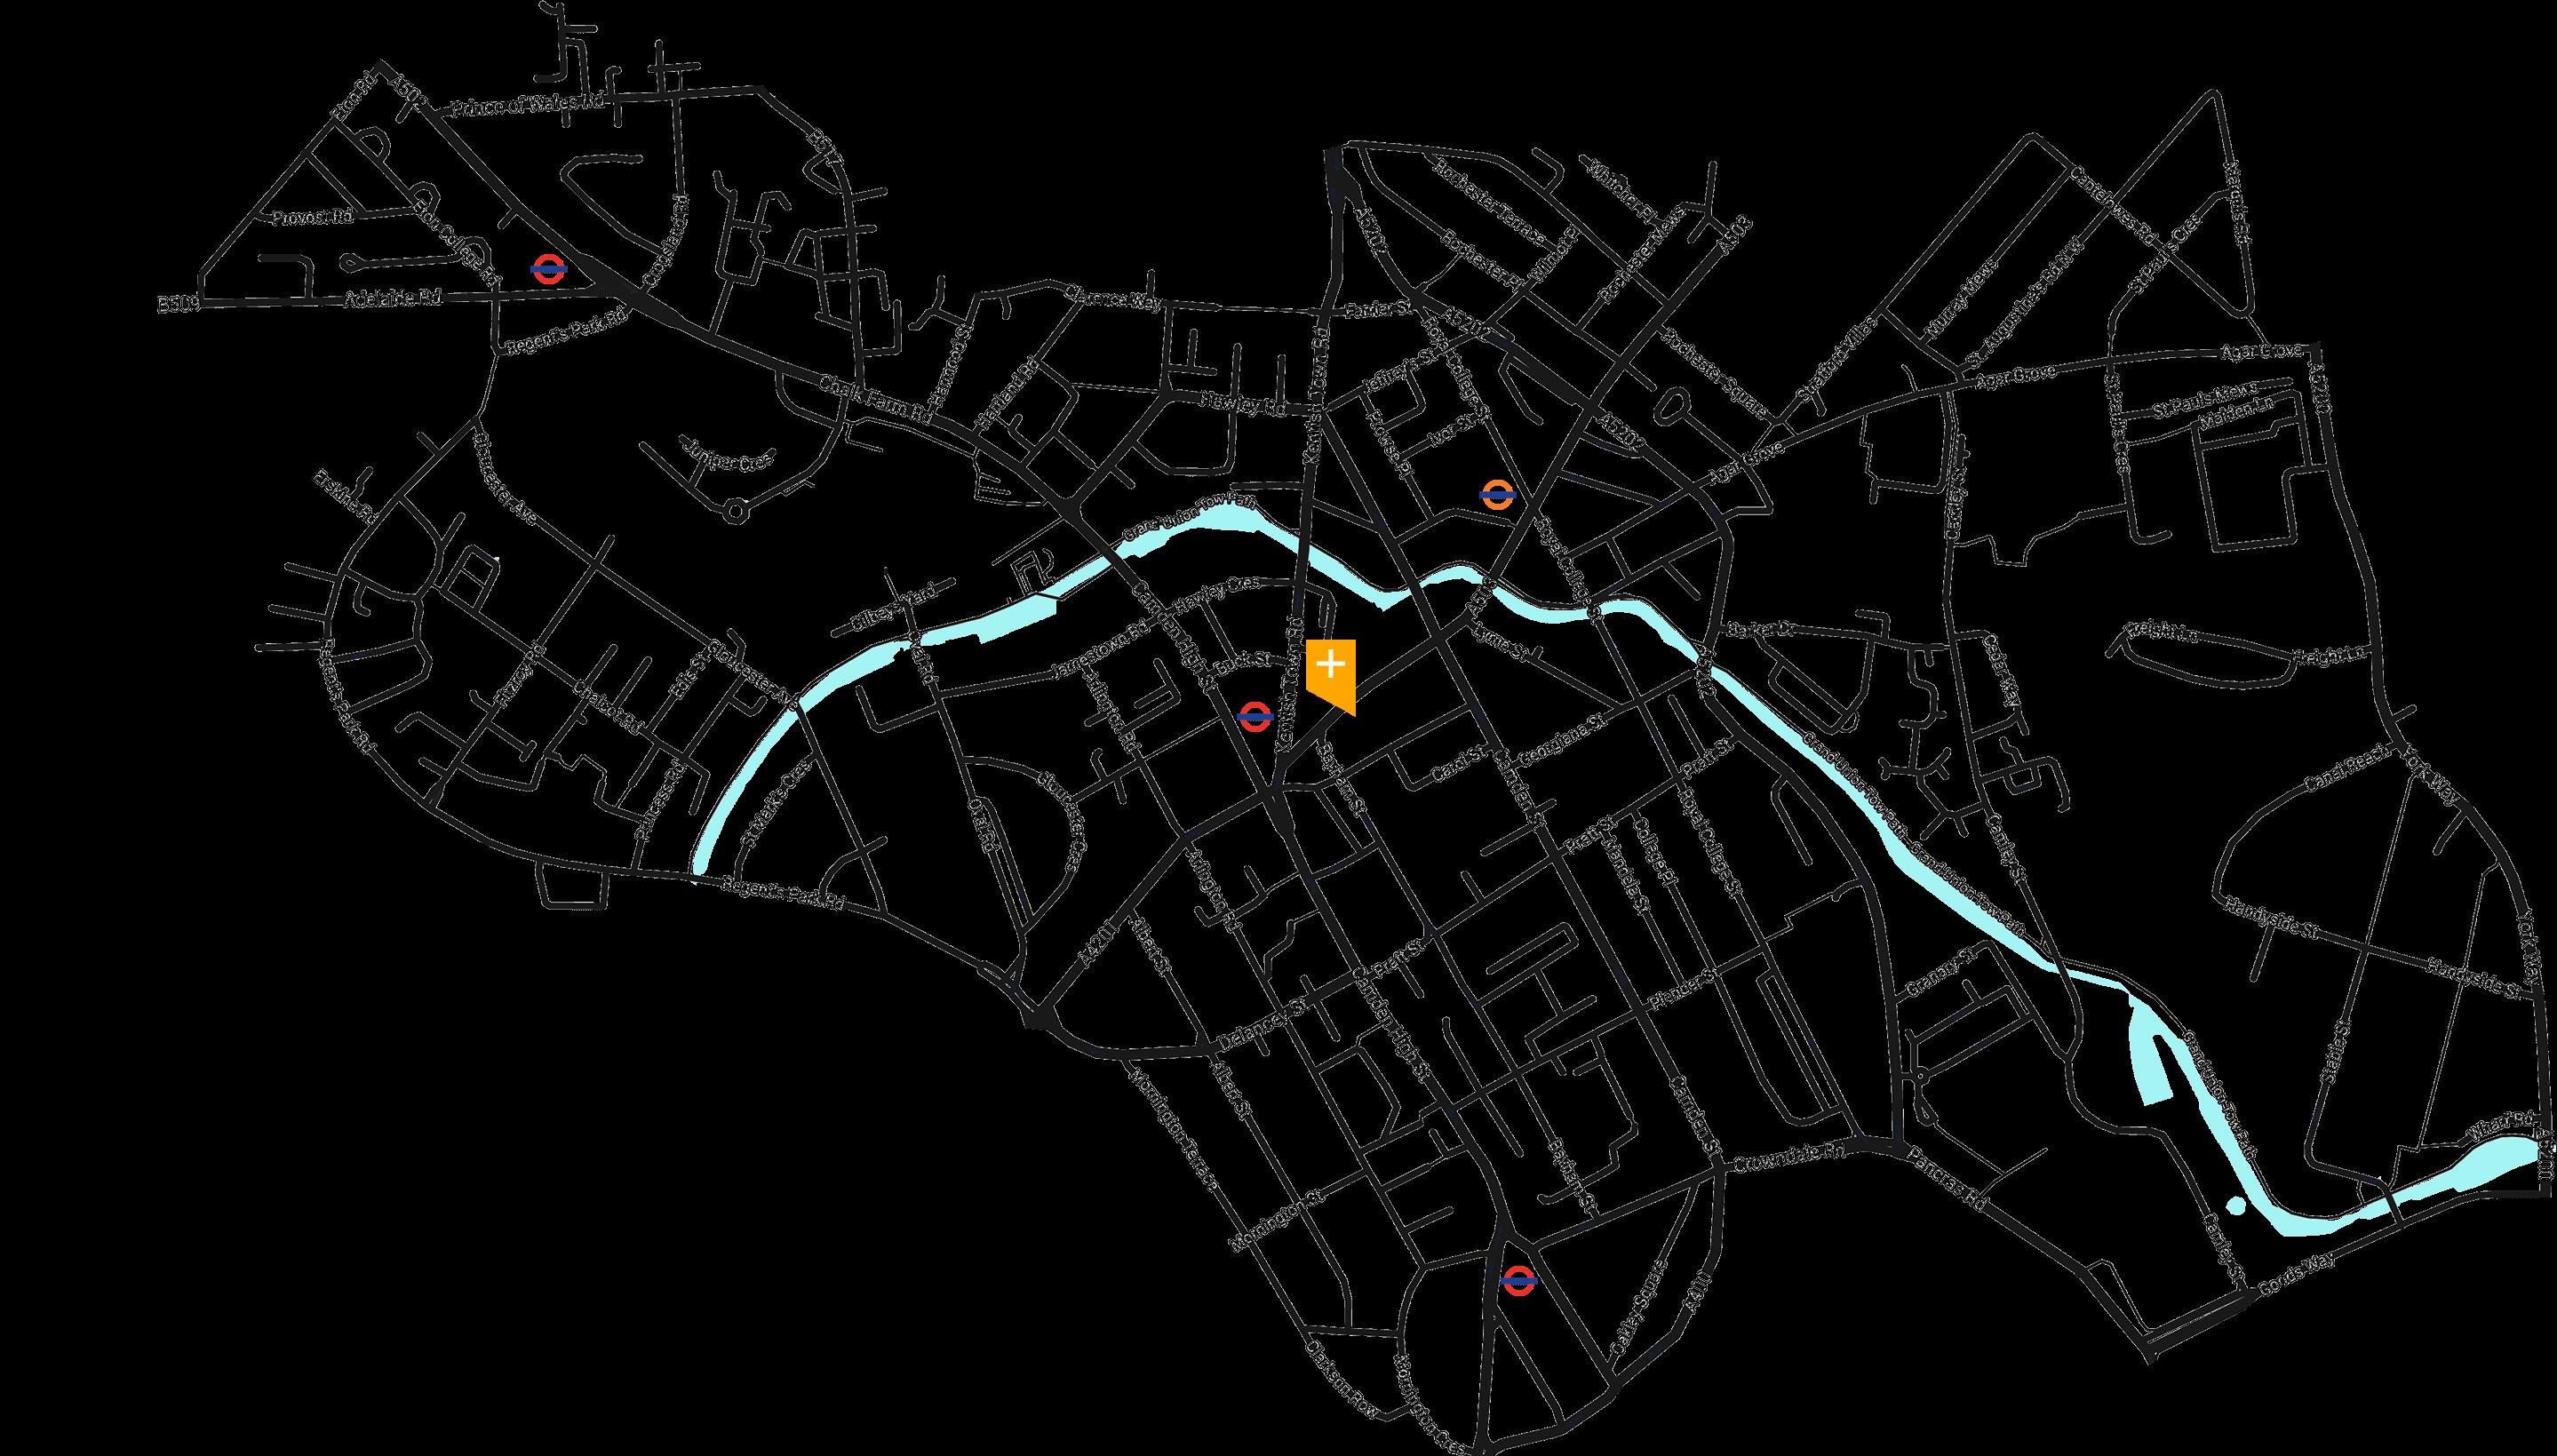 Saint map